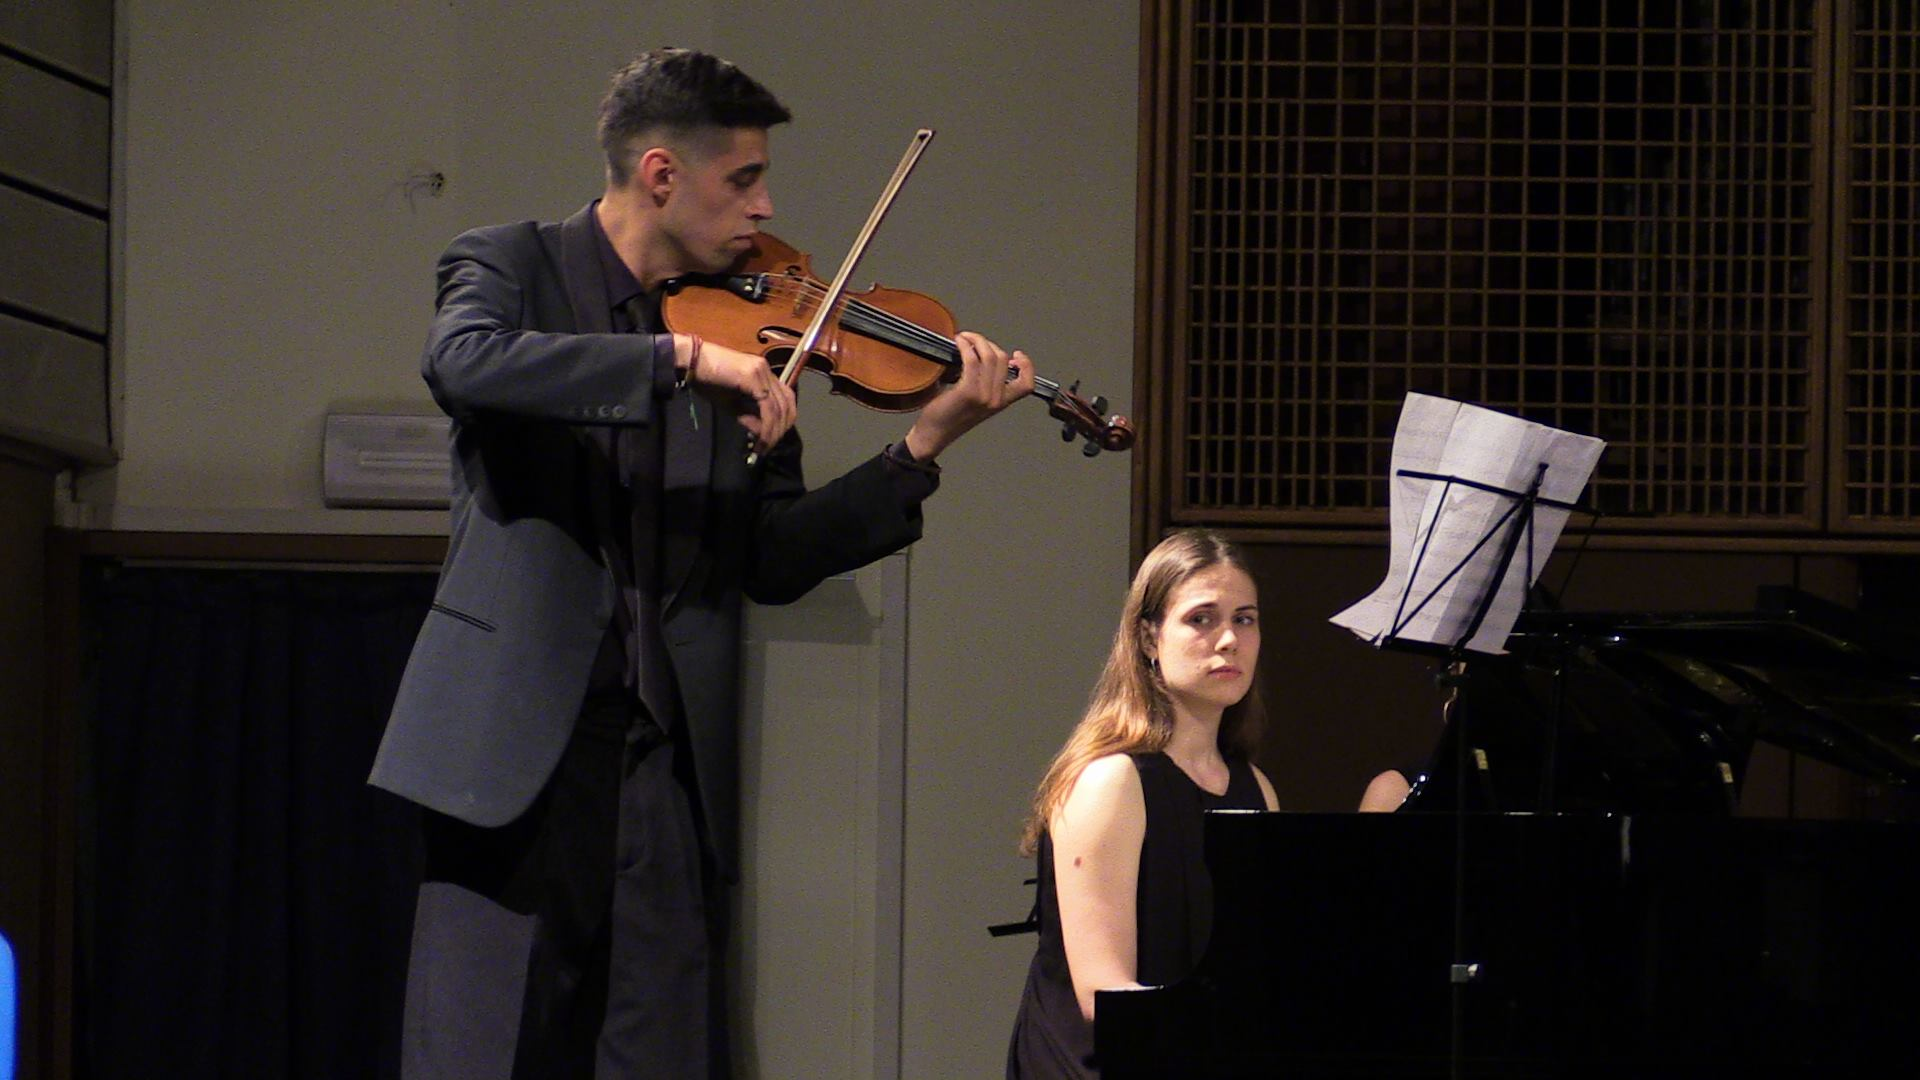 'Essentia' [vl & pno] uruppförs av Duo NED Ensemble @Desenzano